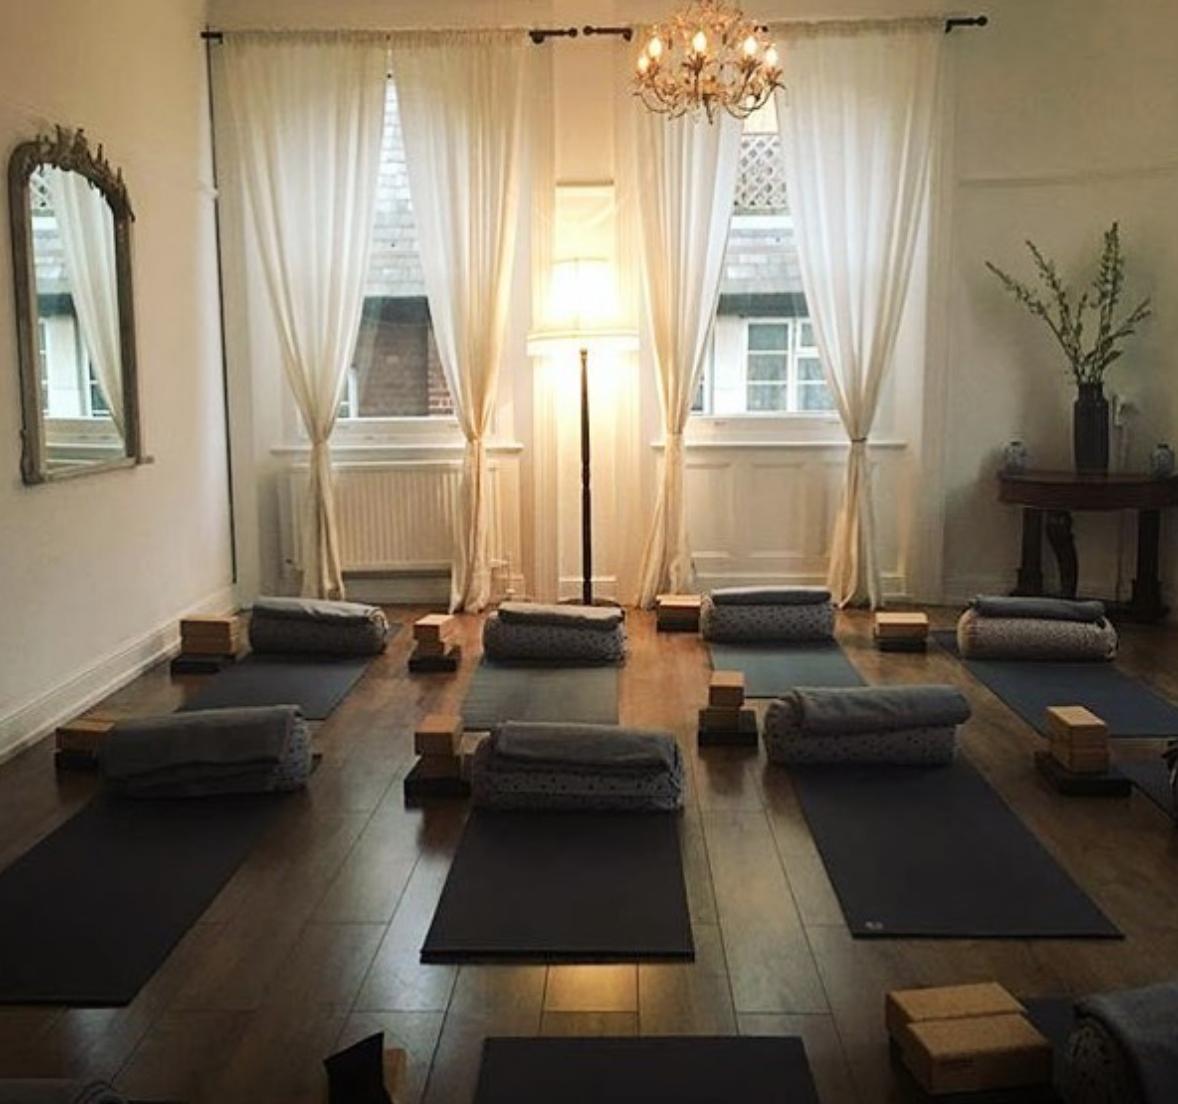 Yoga with Nahid: A boutique yoga experience near Ravenscourt Park